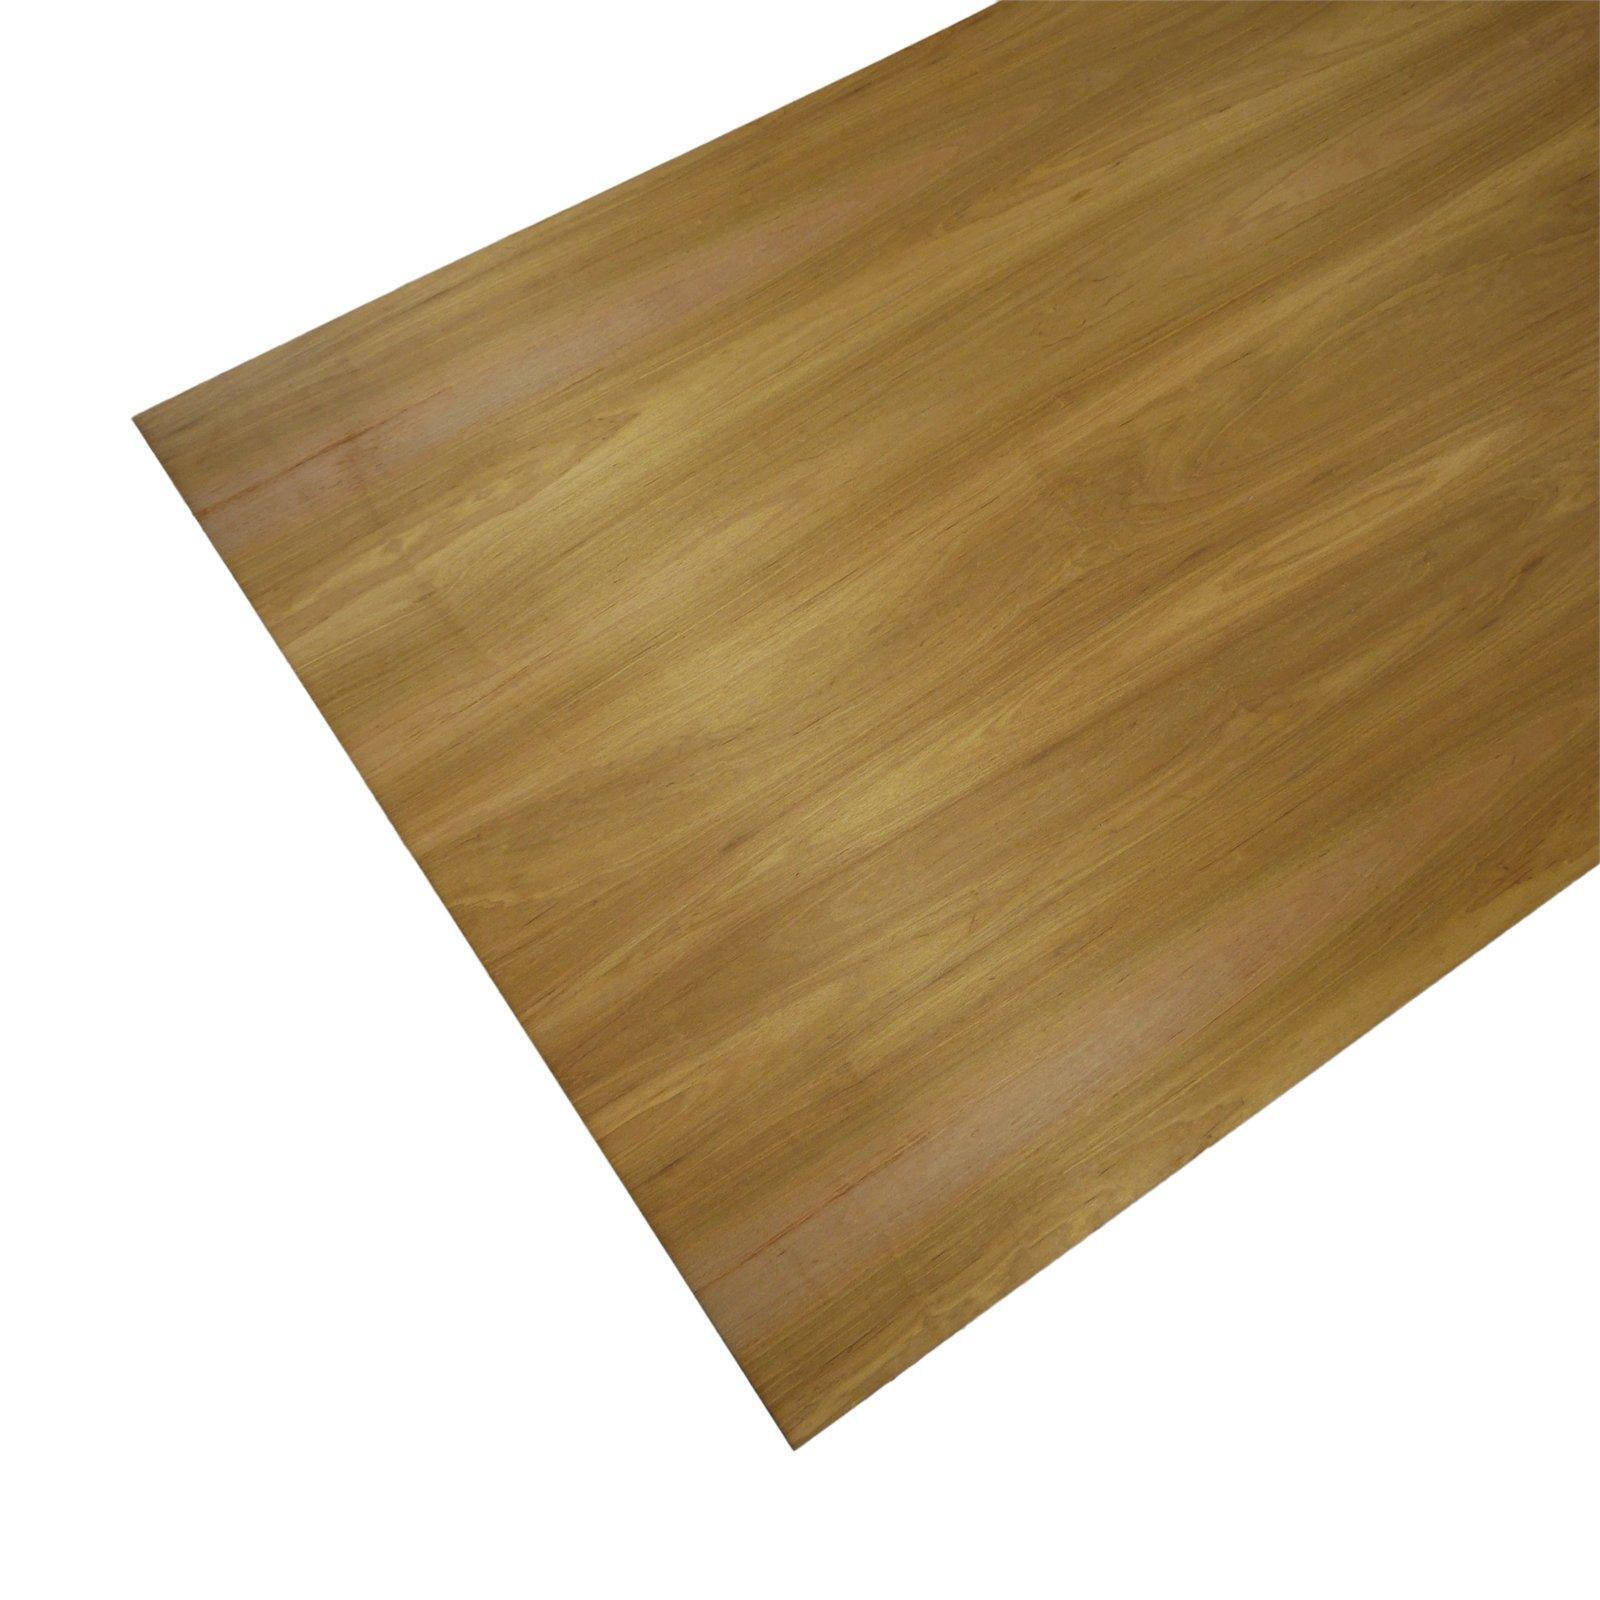 IBS 1220 x 605 x 9mm Marine Plywood Mini Panel